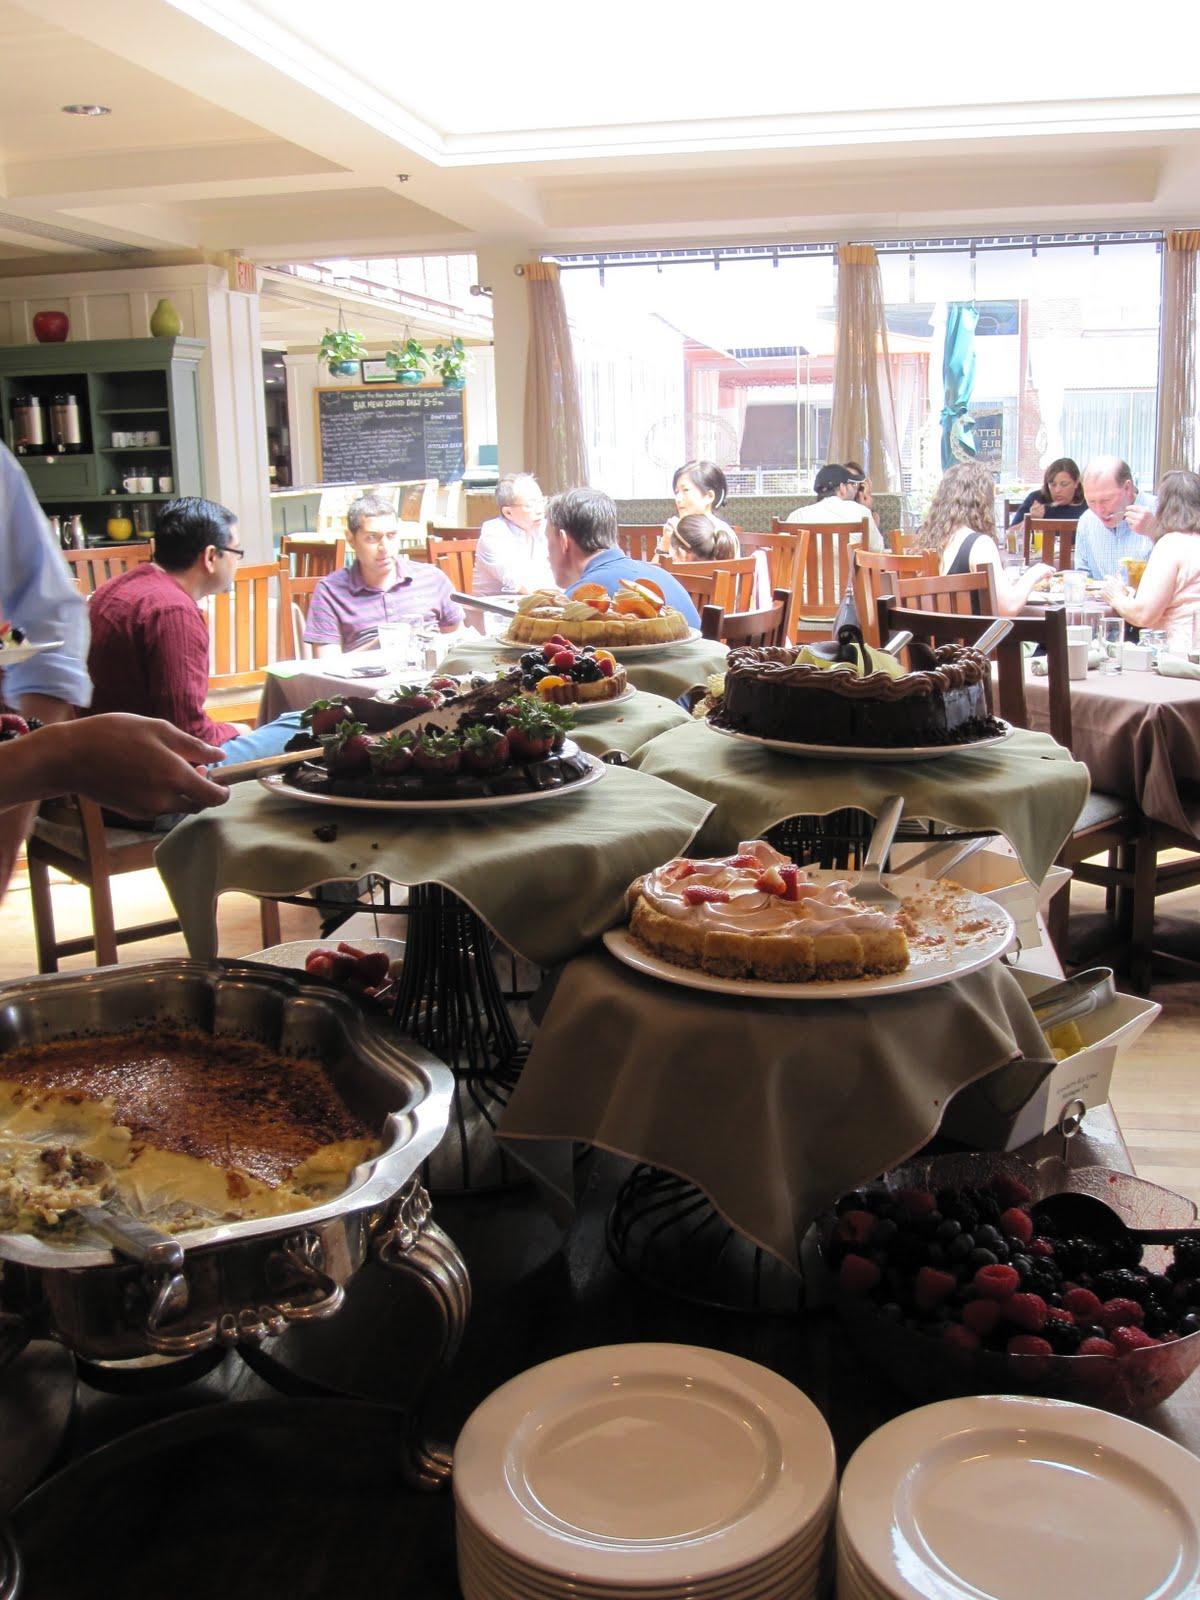 the quest for the perfect brunch: henrietta's table, cambridge, ma